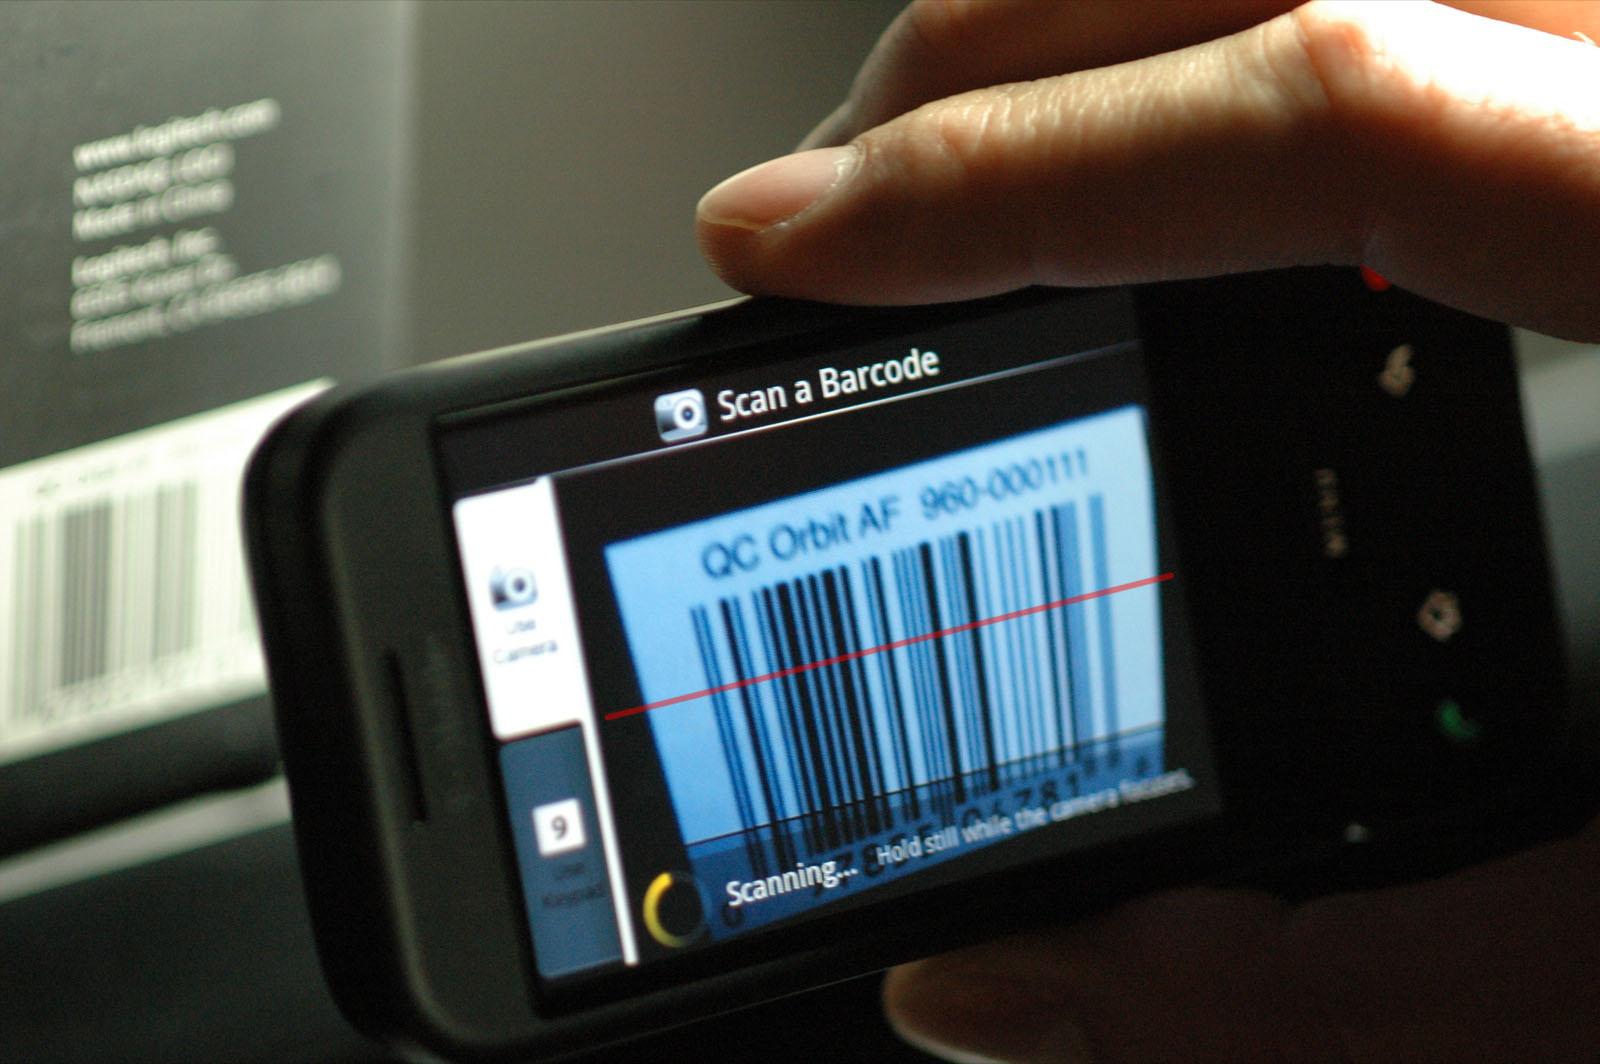 Menghubungkan Android Scanner Barcode Untuk Aplikasi Excel Excel Indonesia User Group